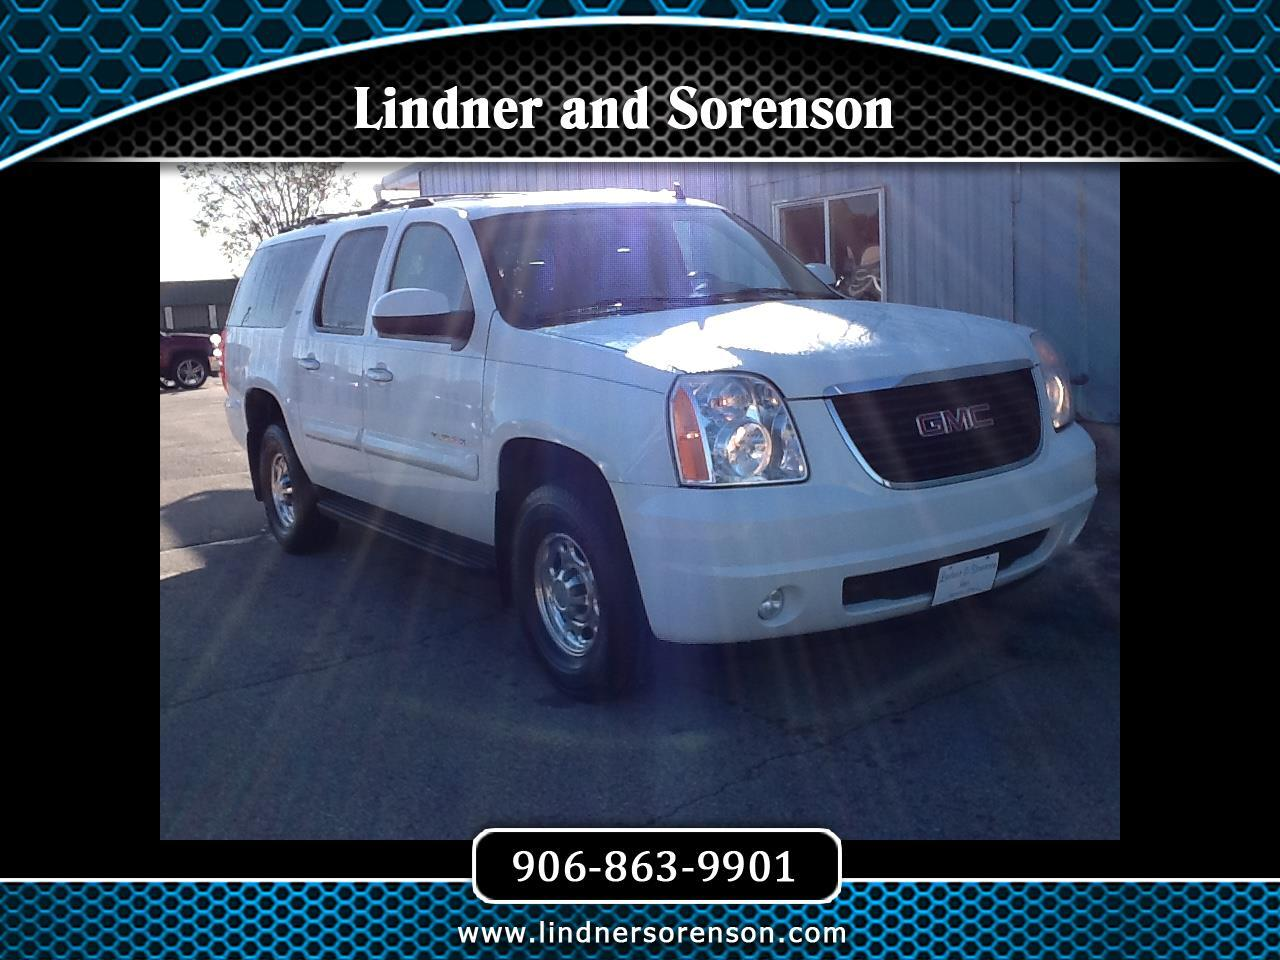 2007 GMC Yukon XL SLE 3/4 Ton 4WD